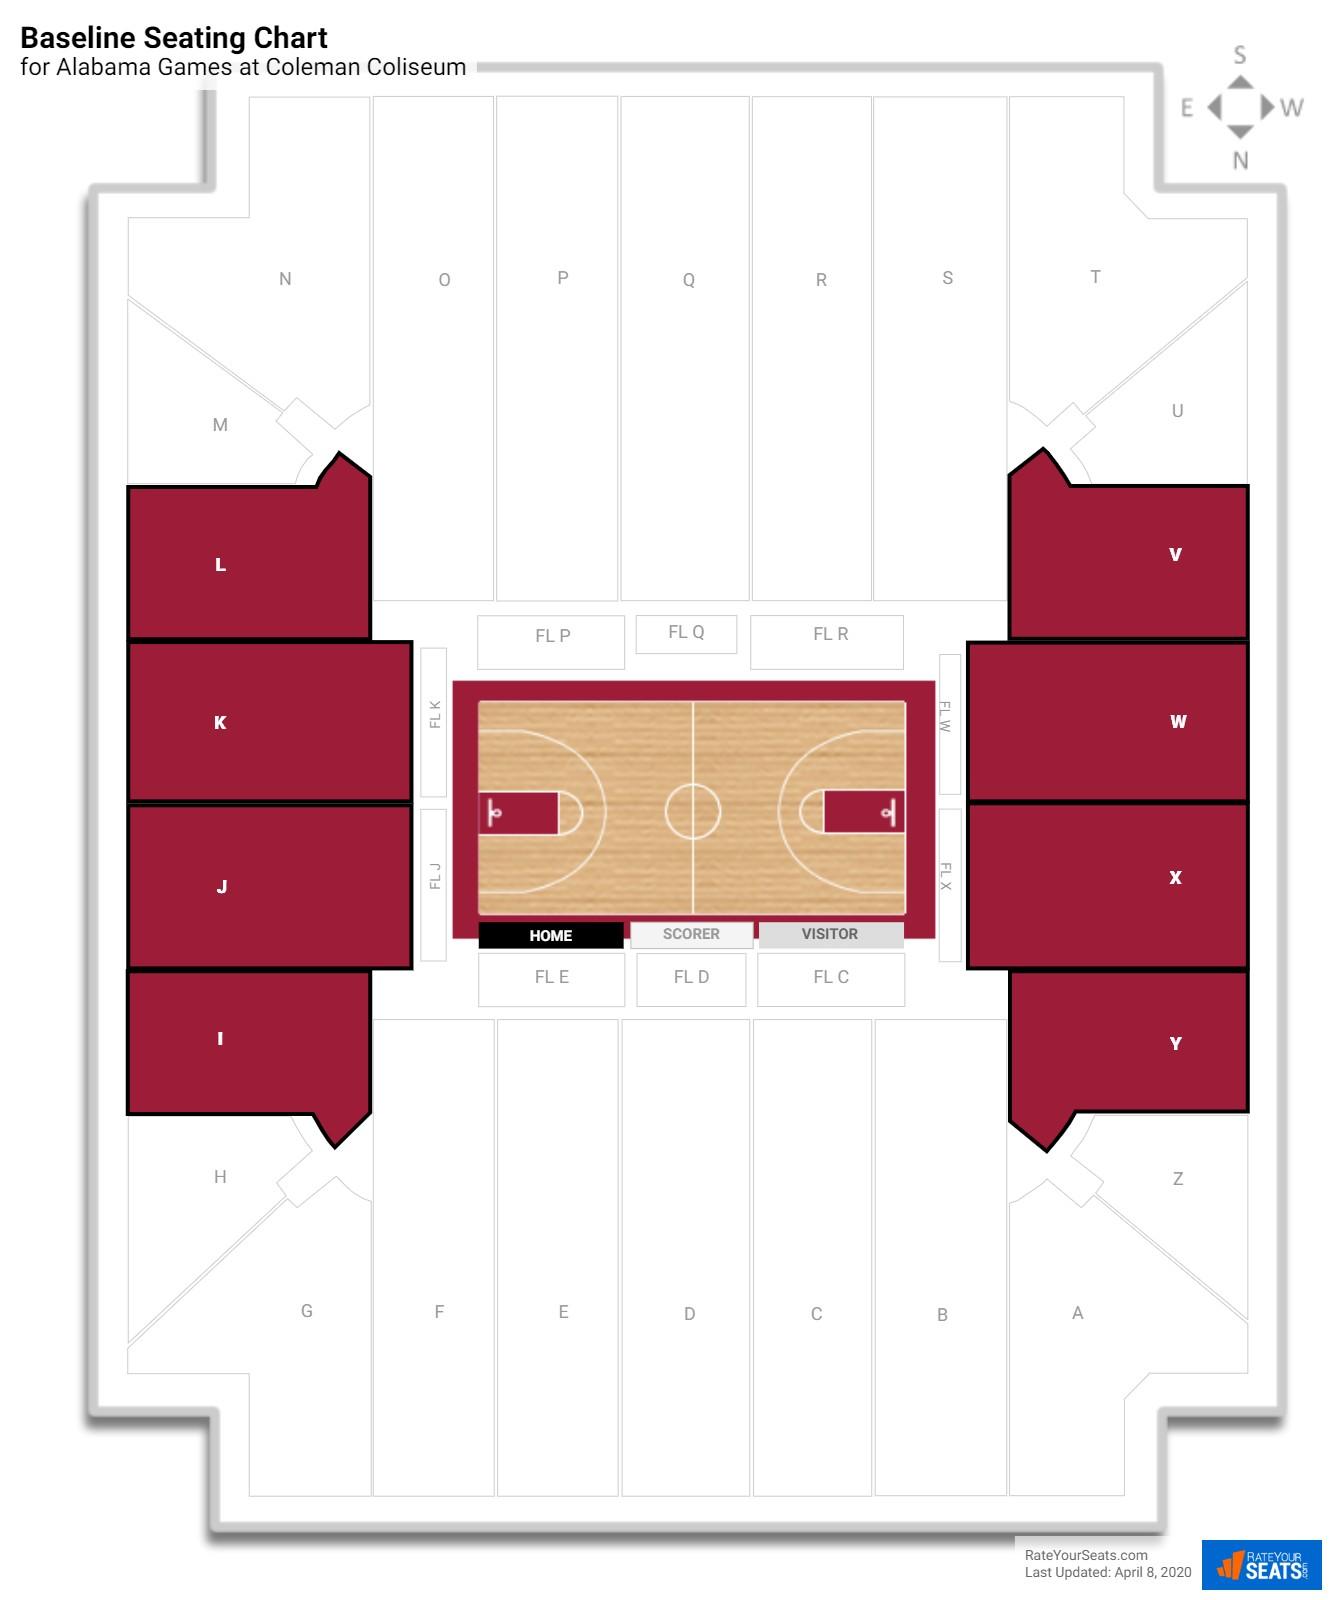 Coleman coliseum alabama seating guide rateyourseats coleman coliseum baseline seating chart nvjuhfo Choice Image